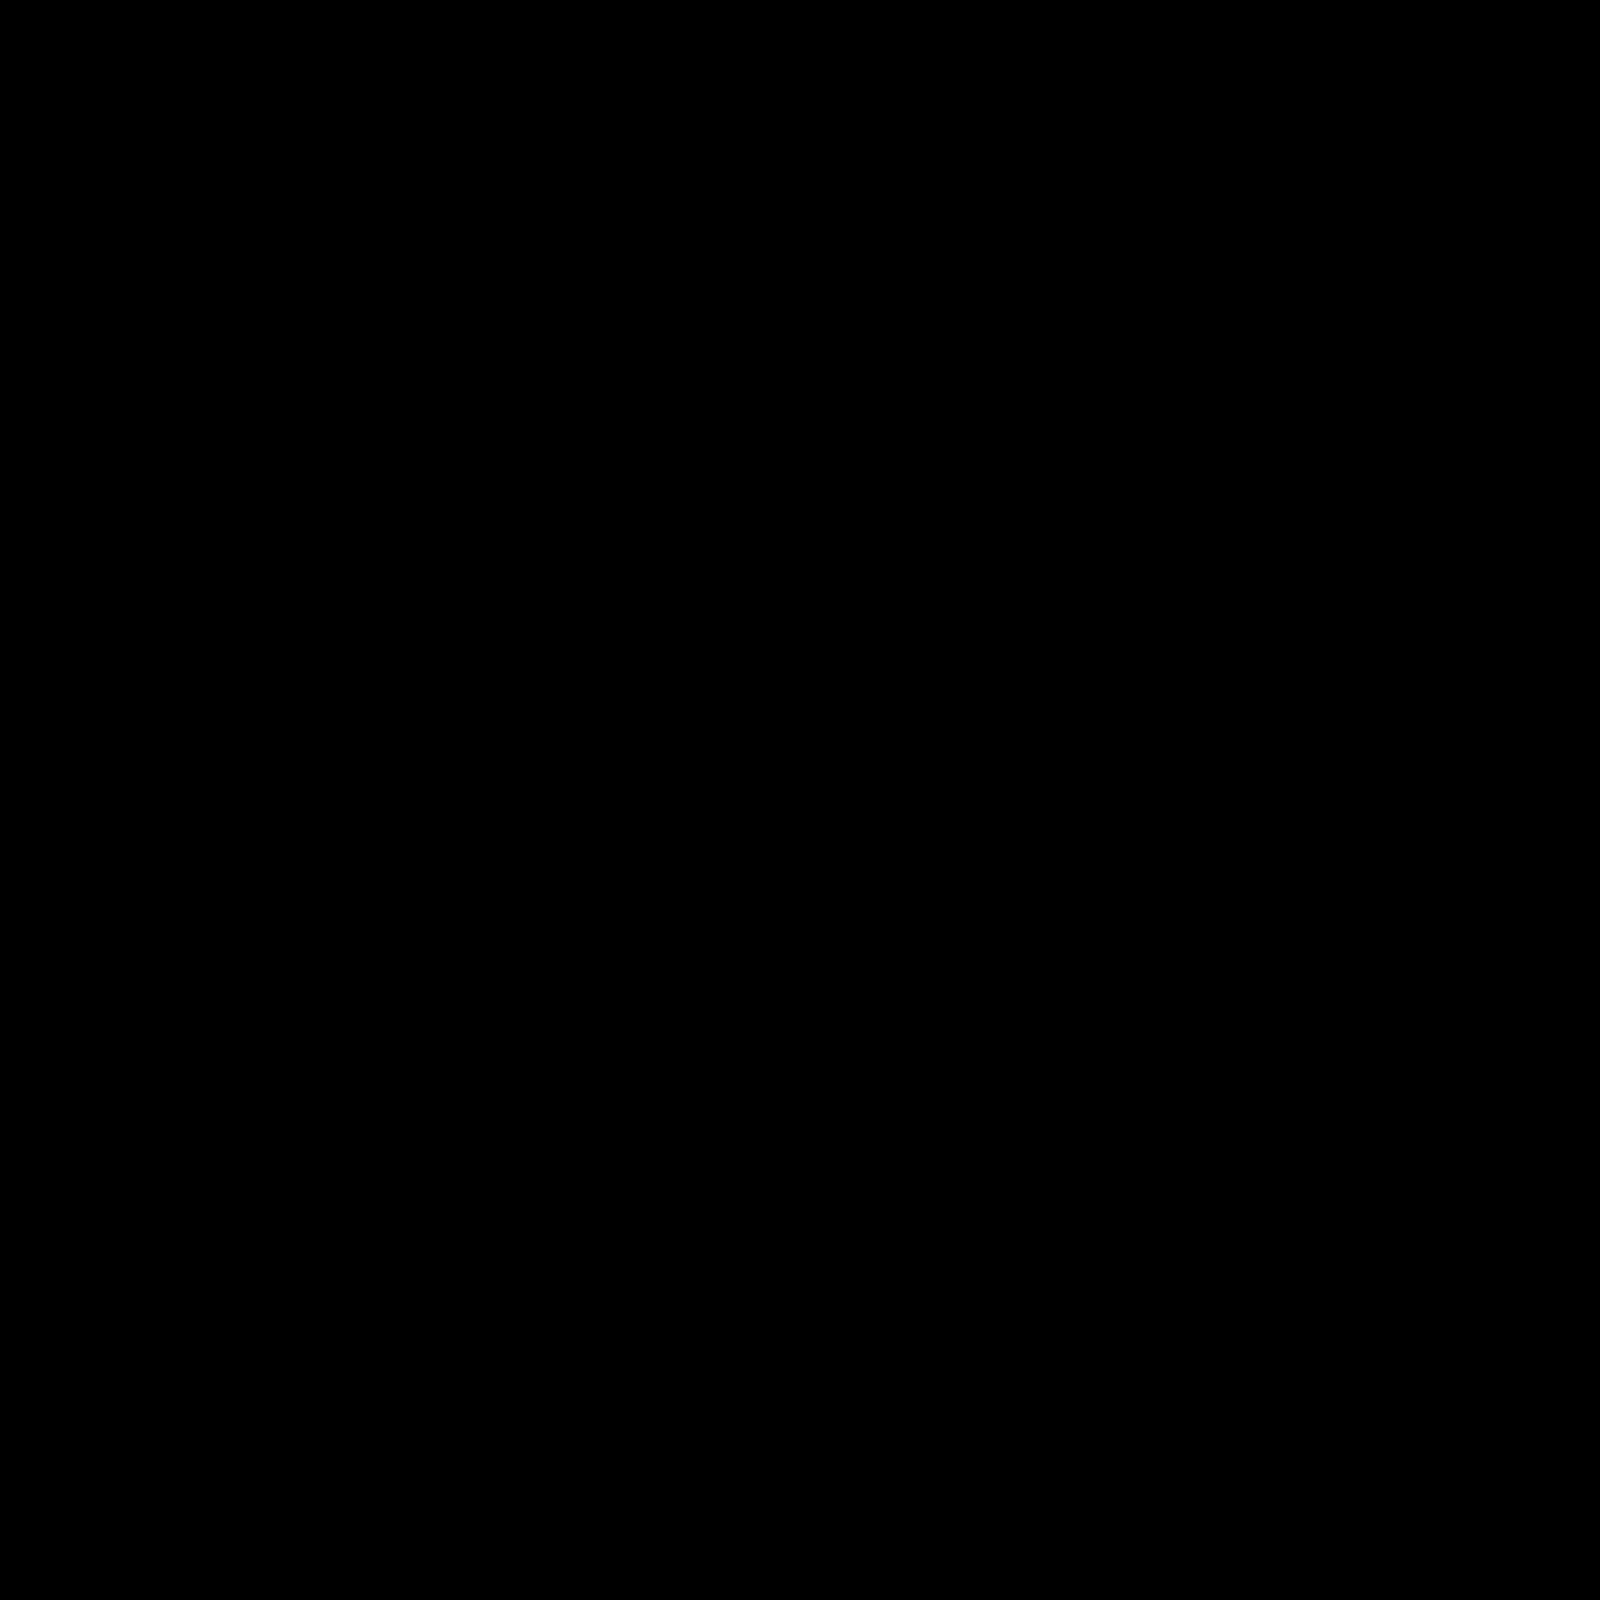 Chamfer icon